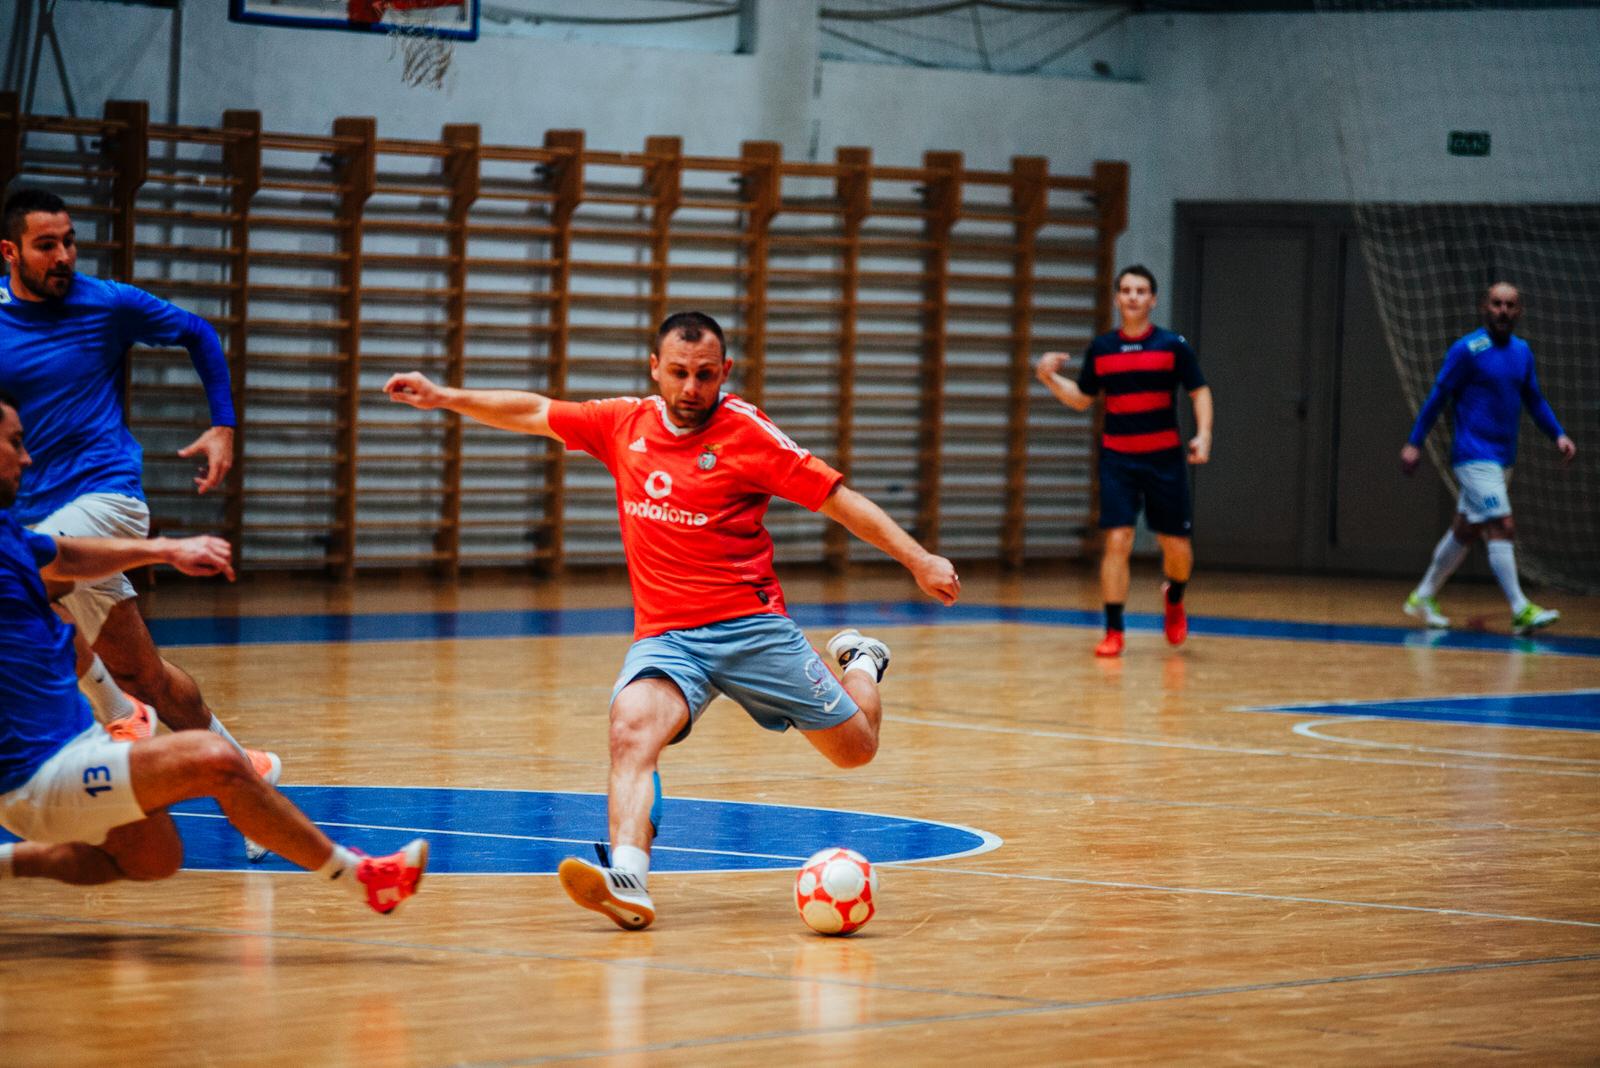 likaclub_zimska-malonogometna-liga-gospić_2019-20-113